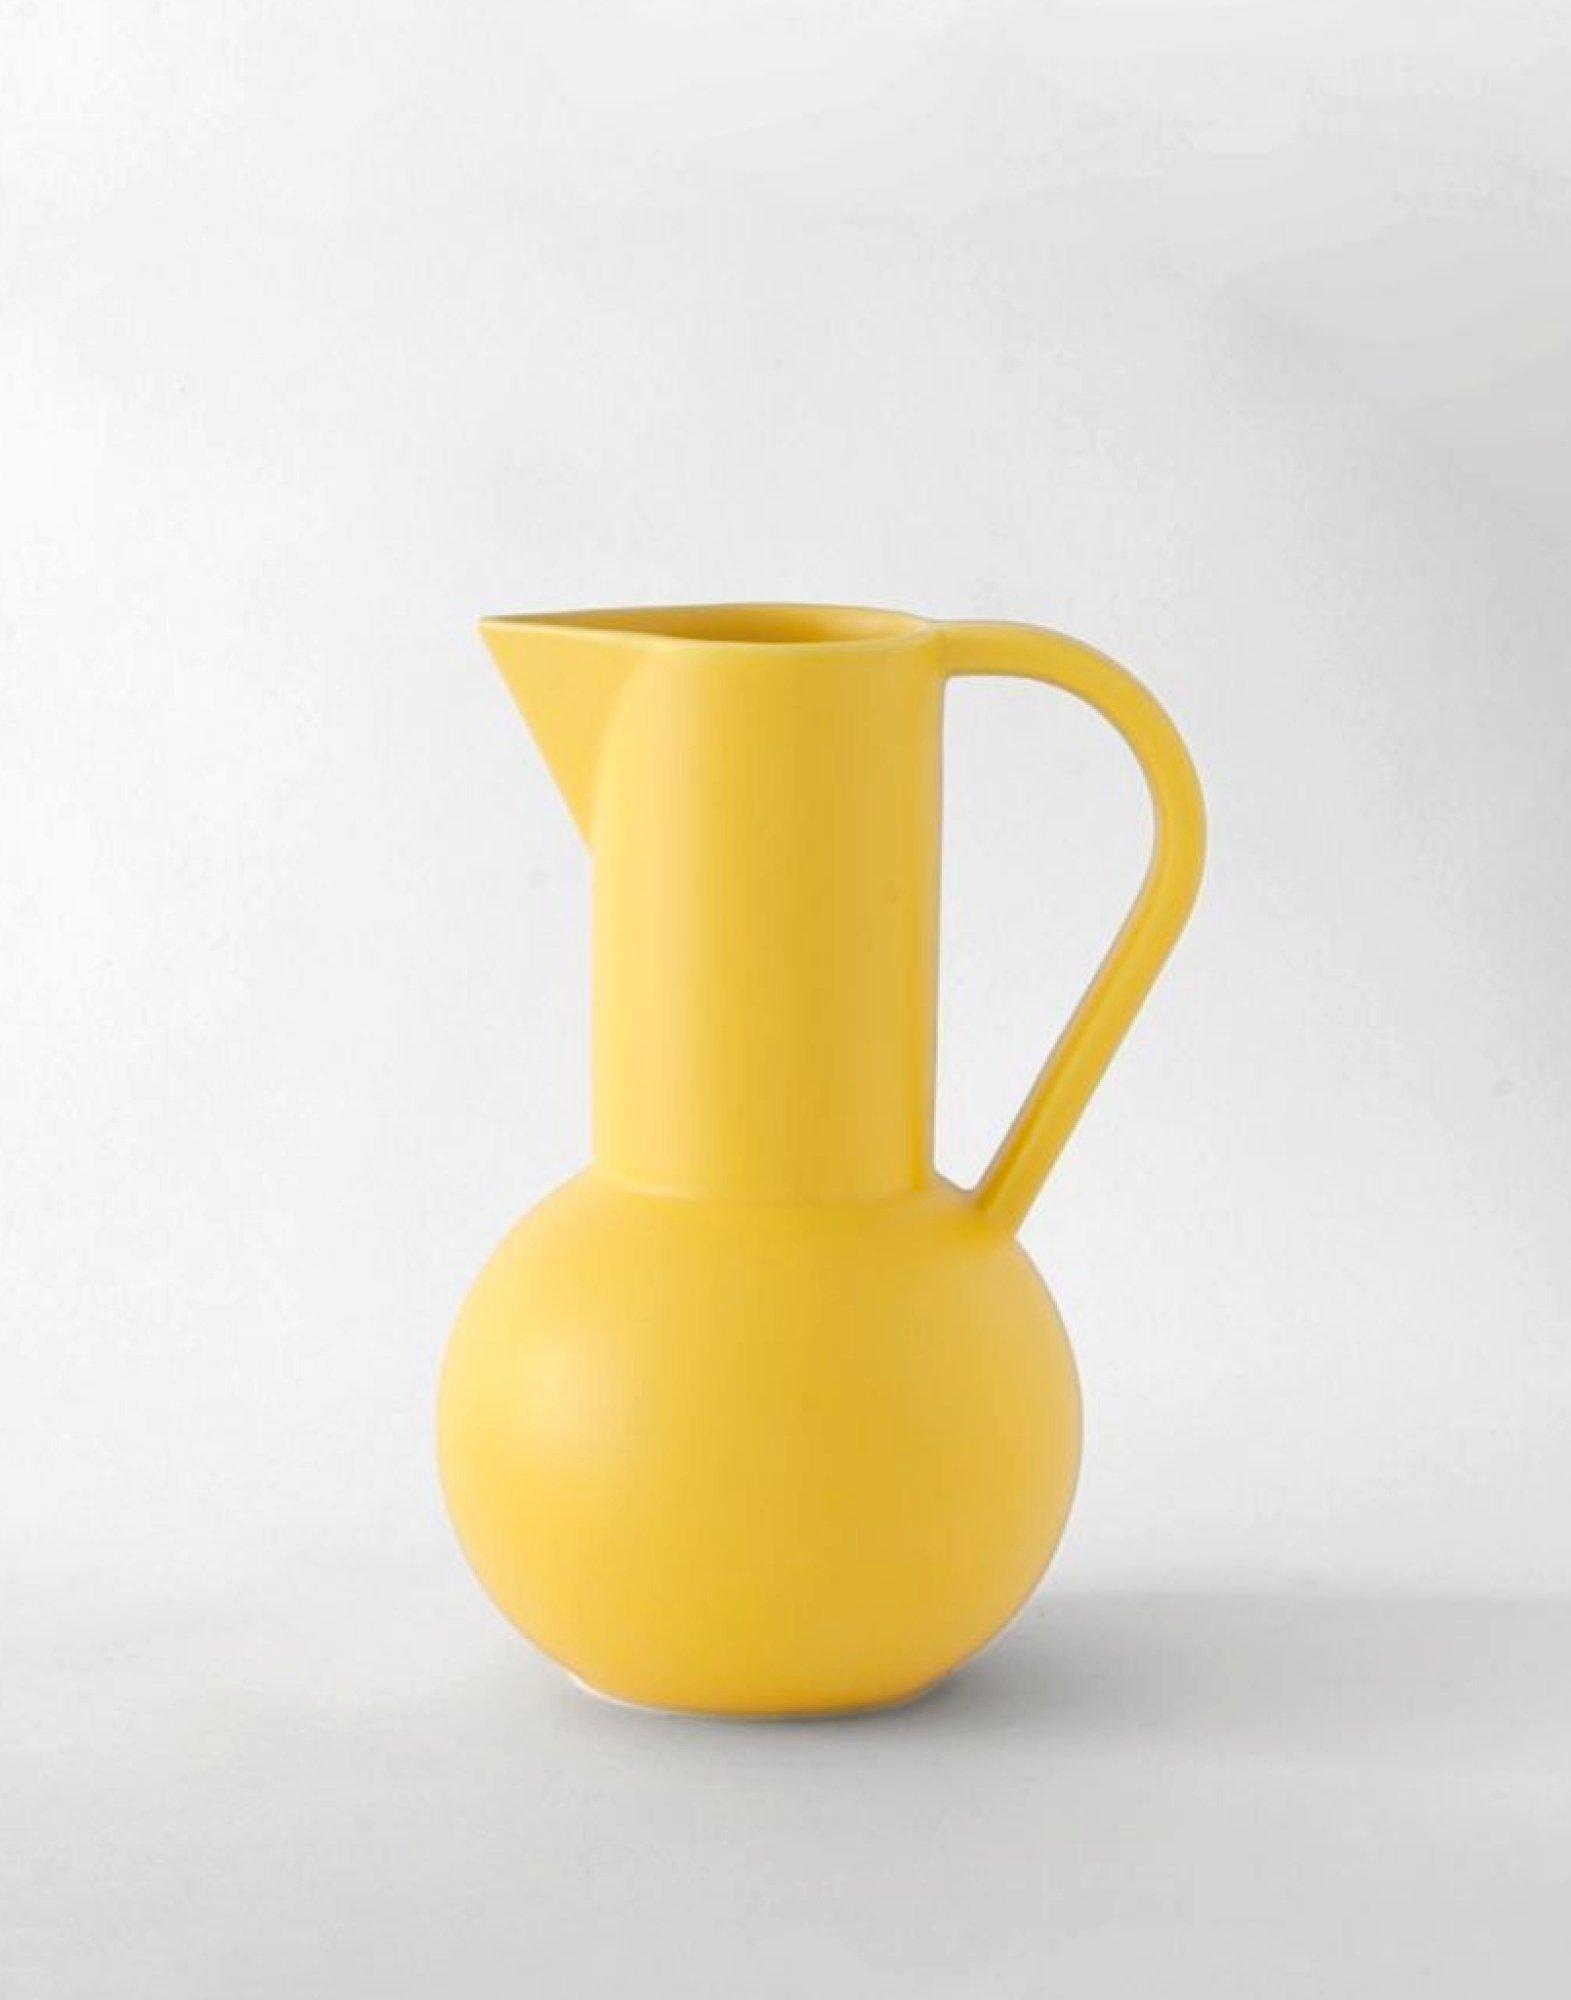 Raawii Medium Jug Strøm Freesia Yellow